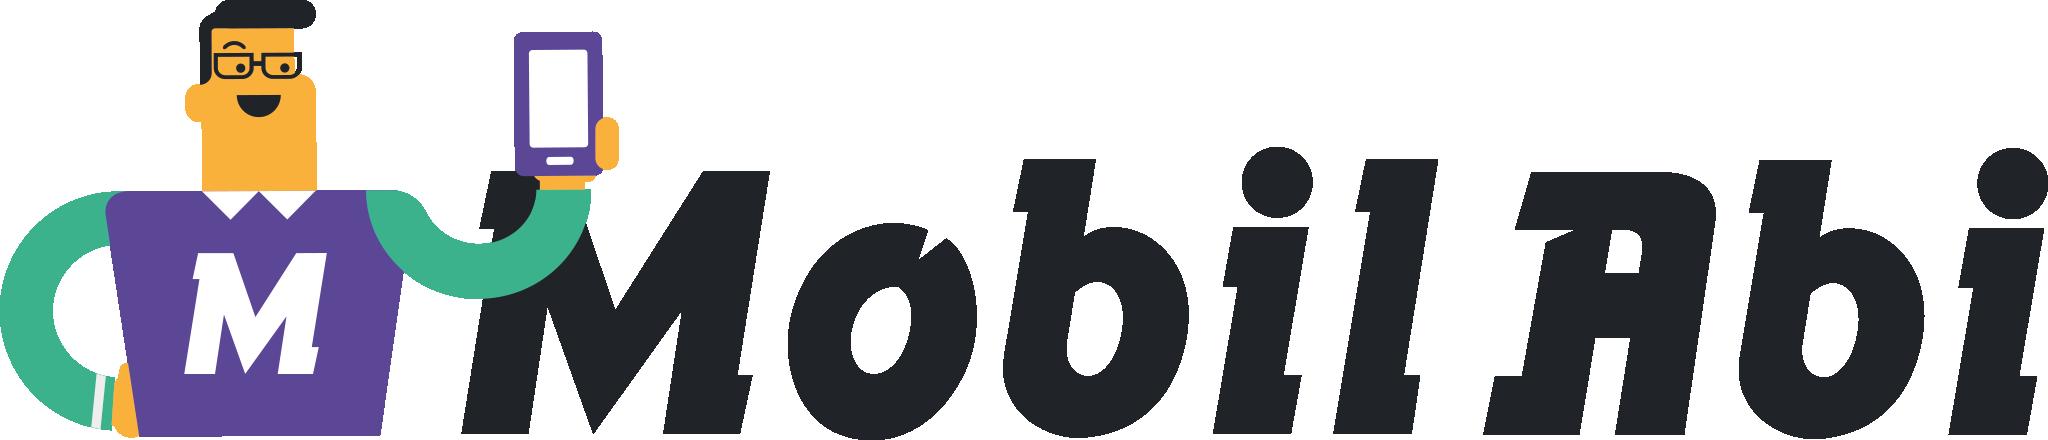 Mobilabi